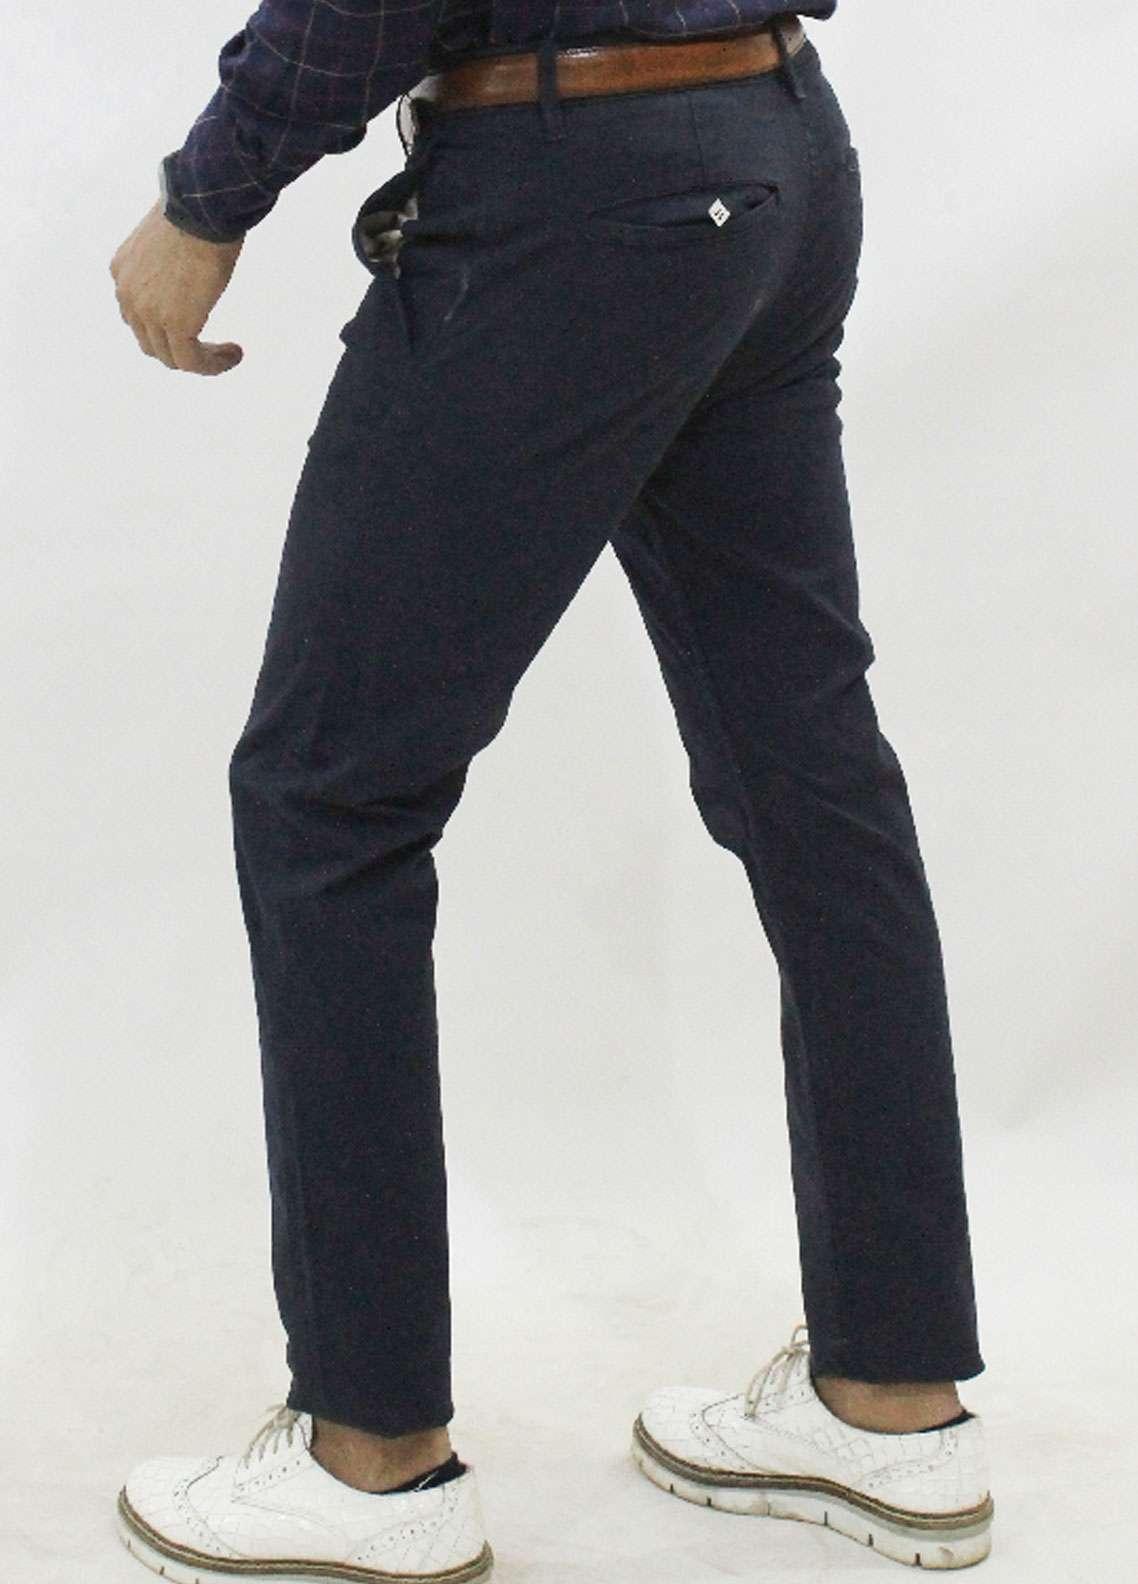 Red Tree Cotton Chino Men Pants - Navy Blue RT5004